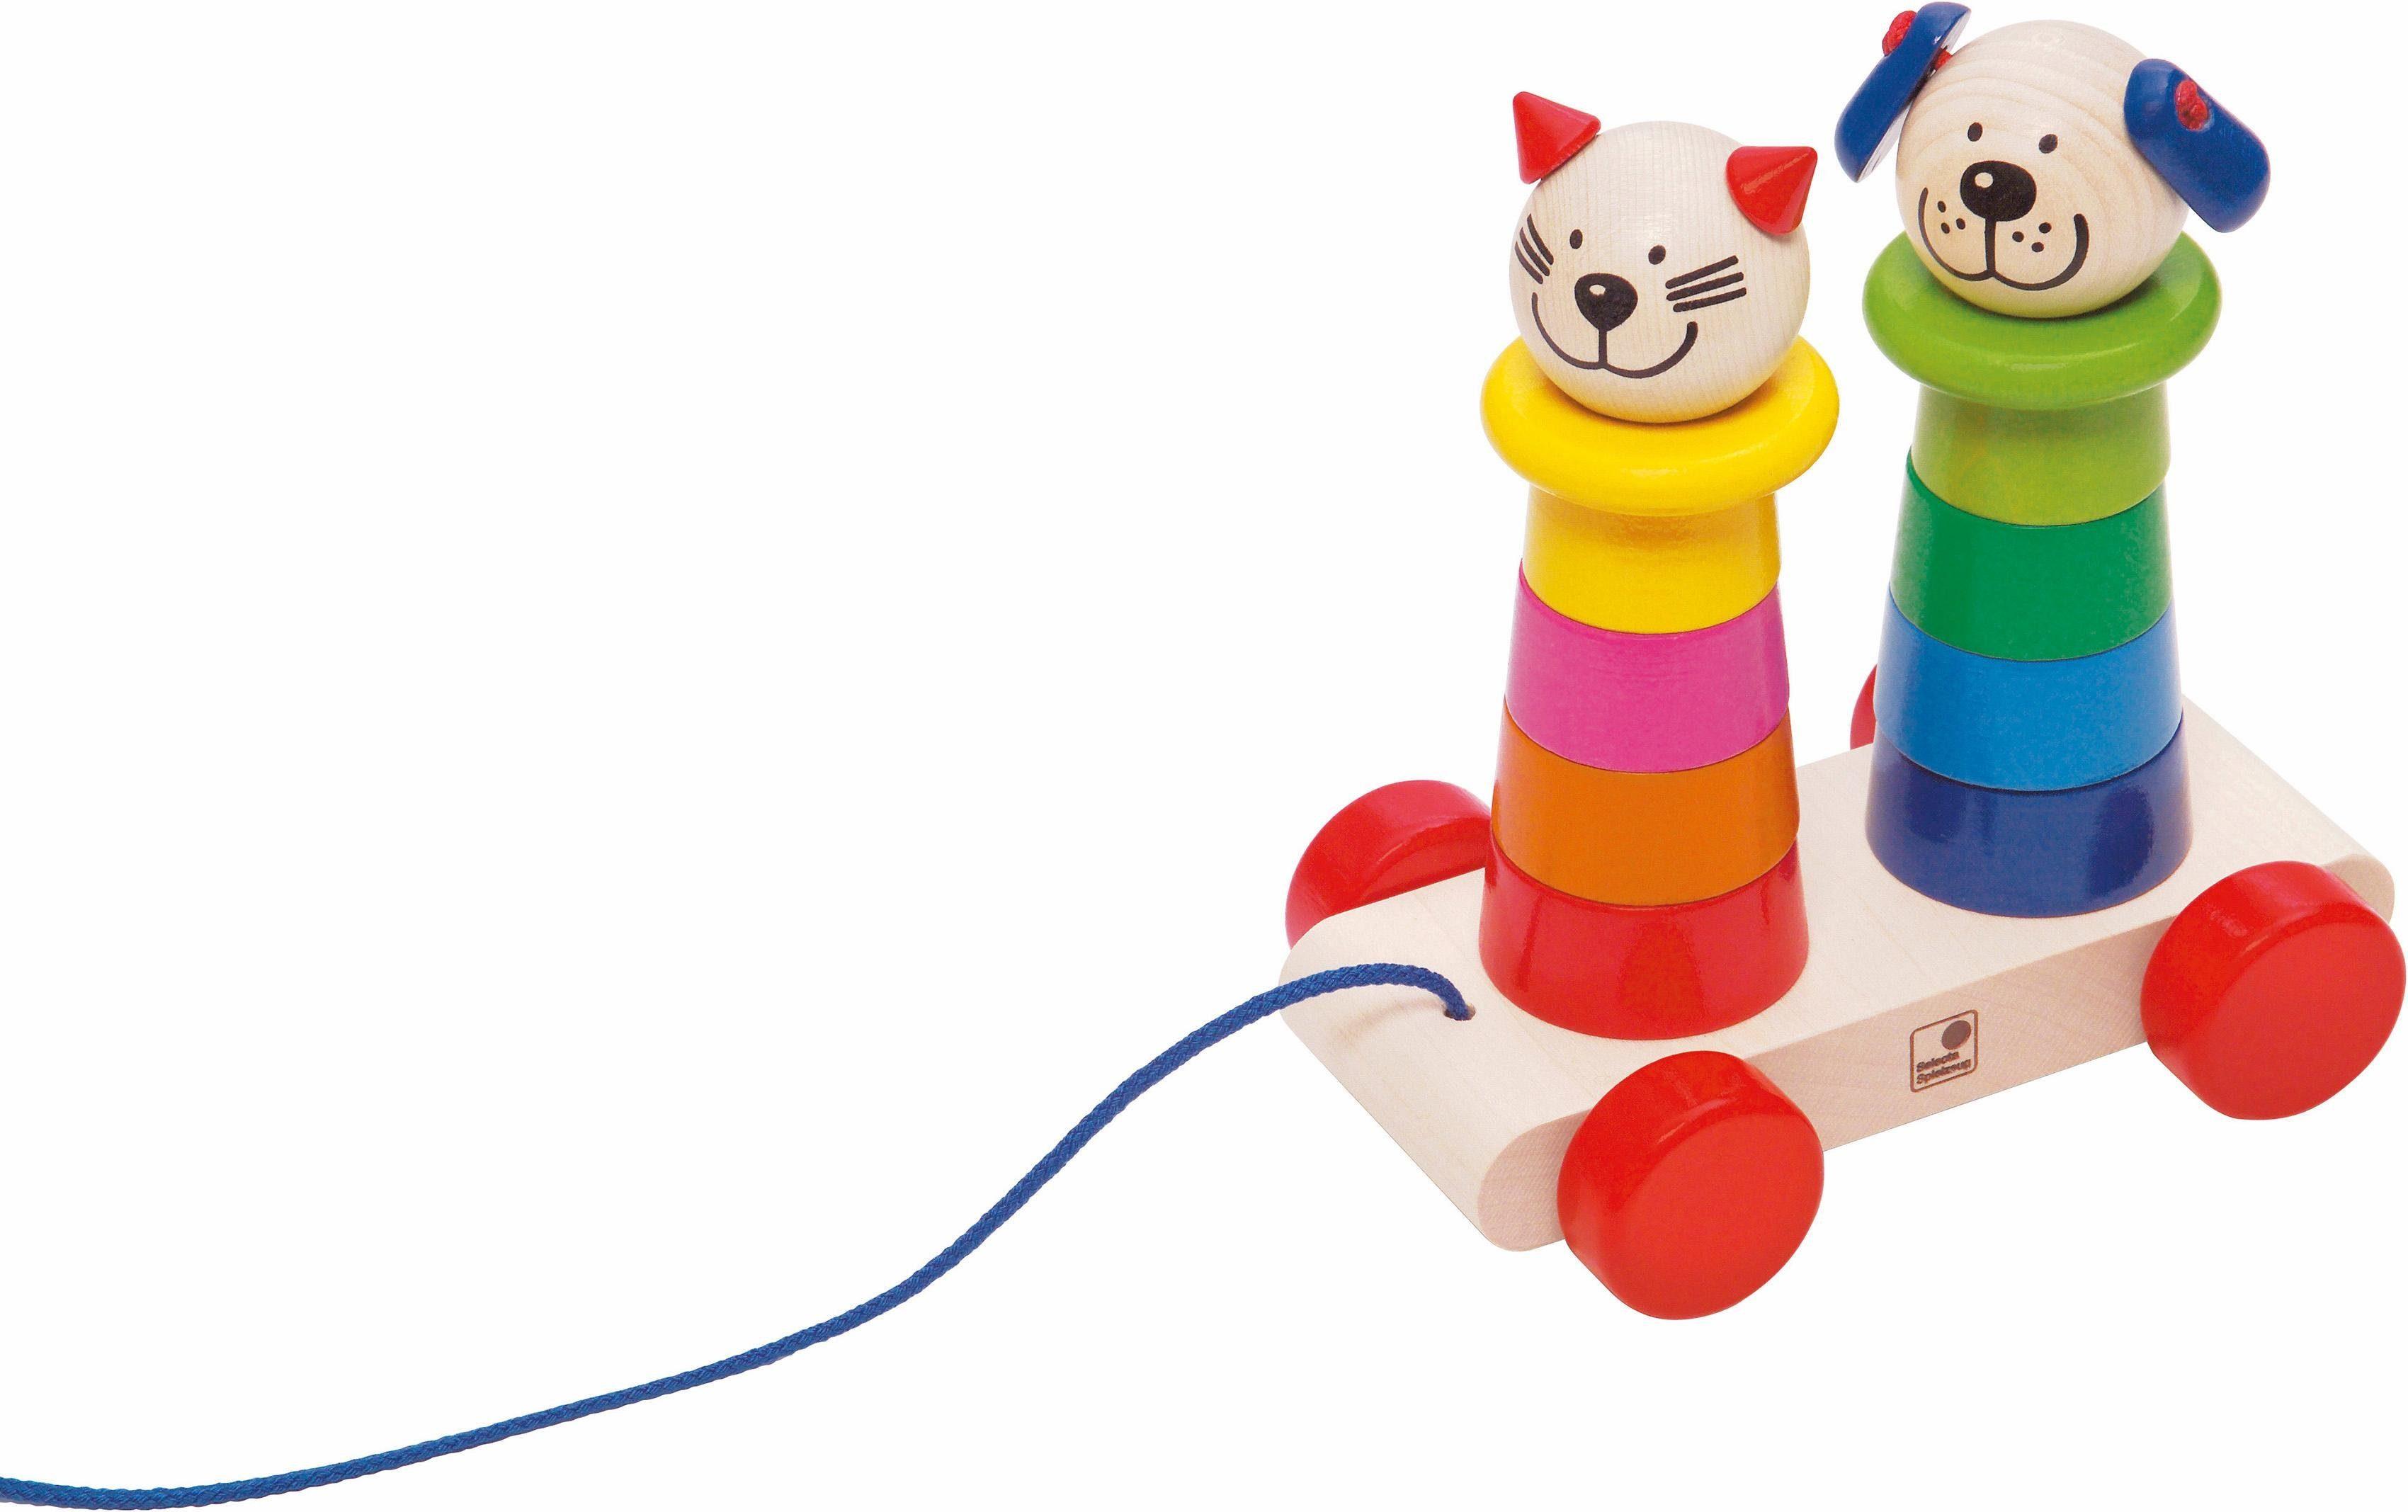 Selecta Nachziehspielzeug mit Steckpyramiden aus Holz, »Filino«